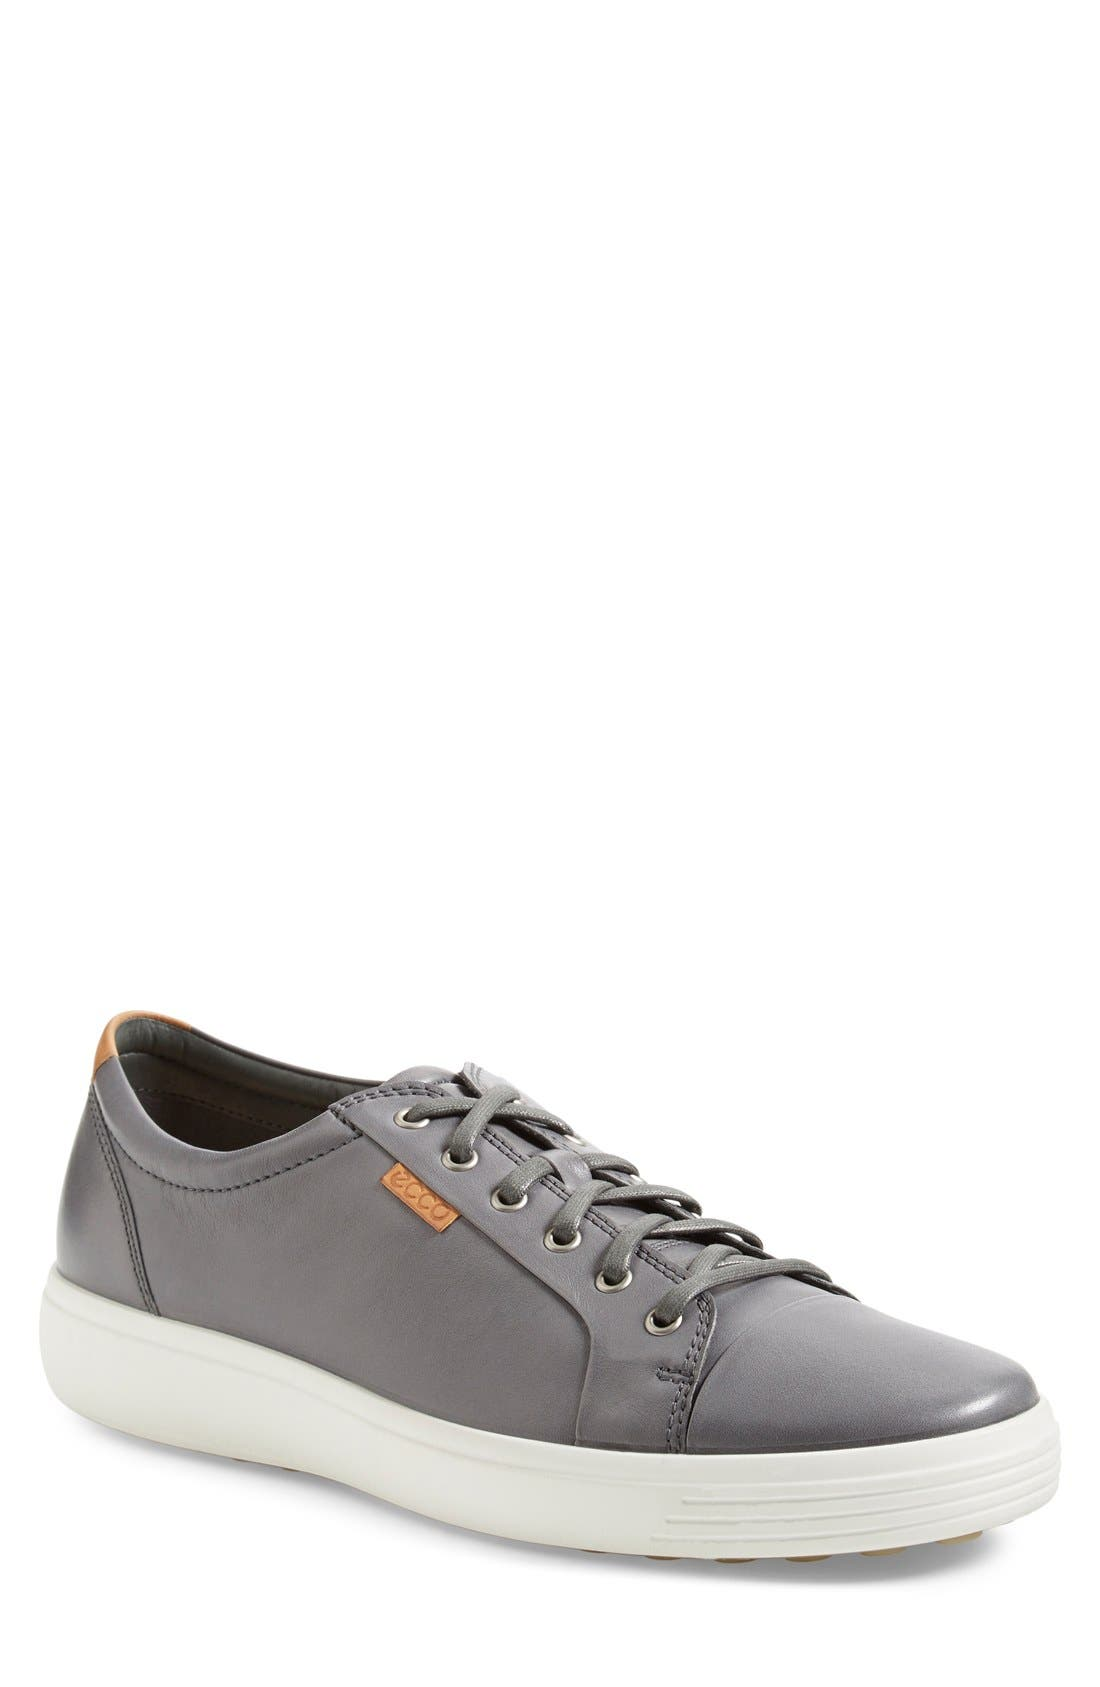 Alternate Image 1 Selected - ECCOSoft VII Lace-Up Sneaker (Men)